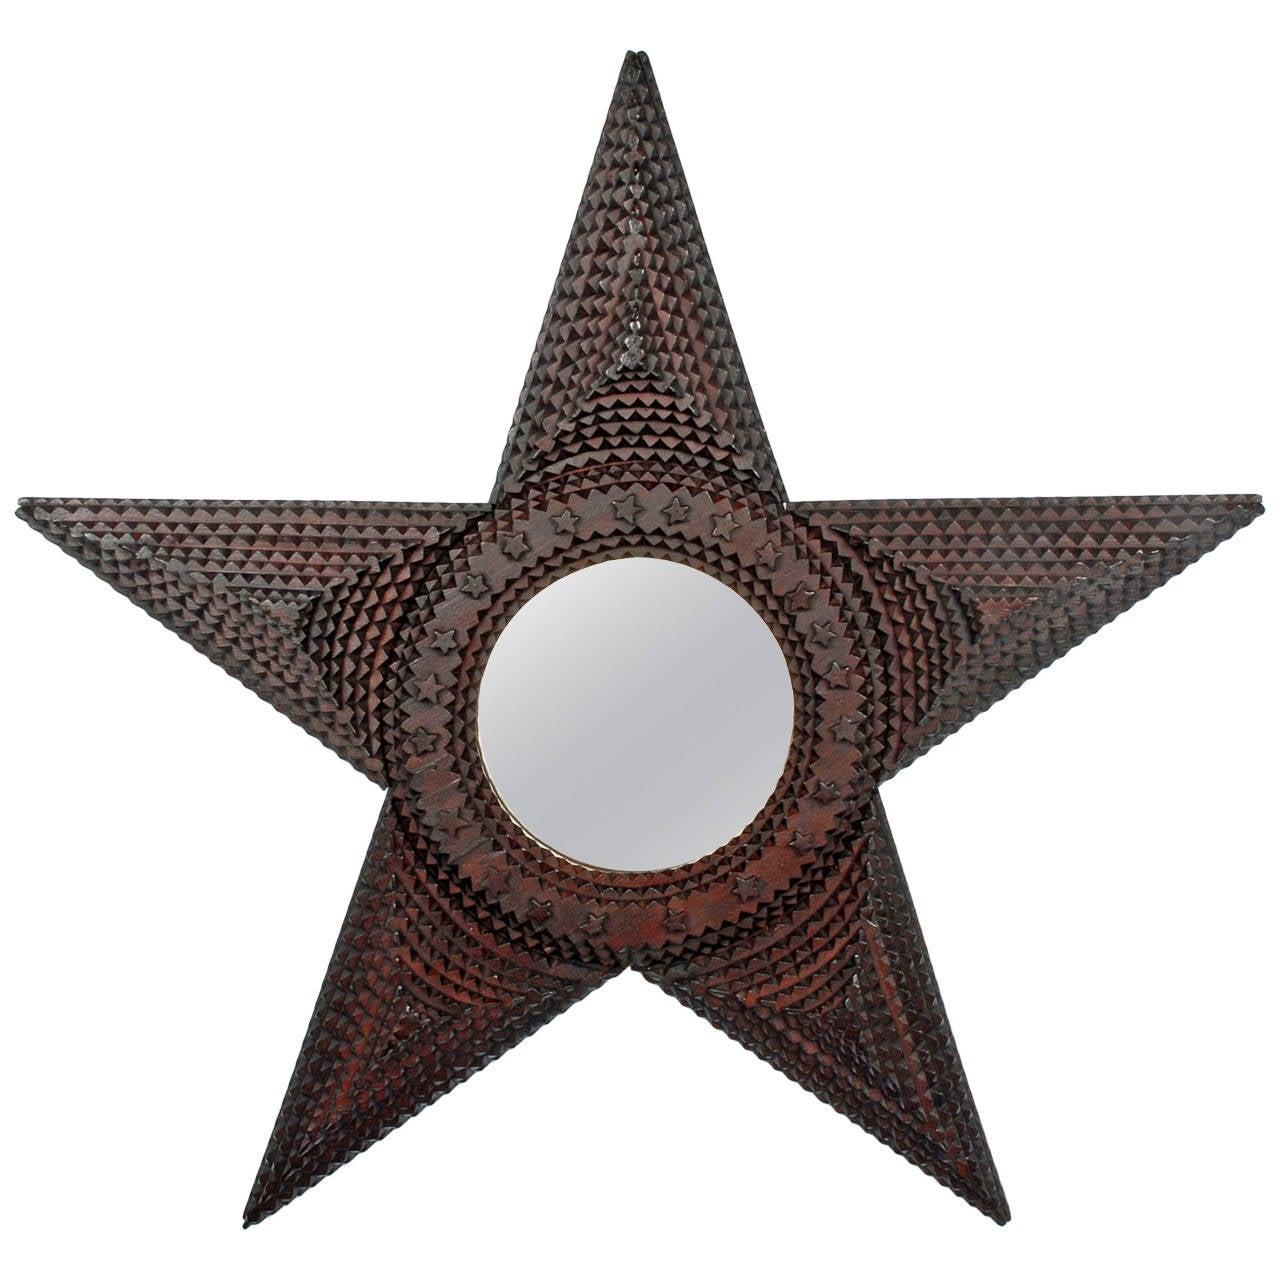 Mirrored Star Wall Decor: Large Star Shaped Tramp Art Mirror, 1890s At 1stdibs